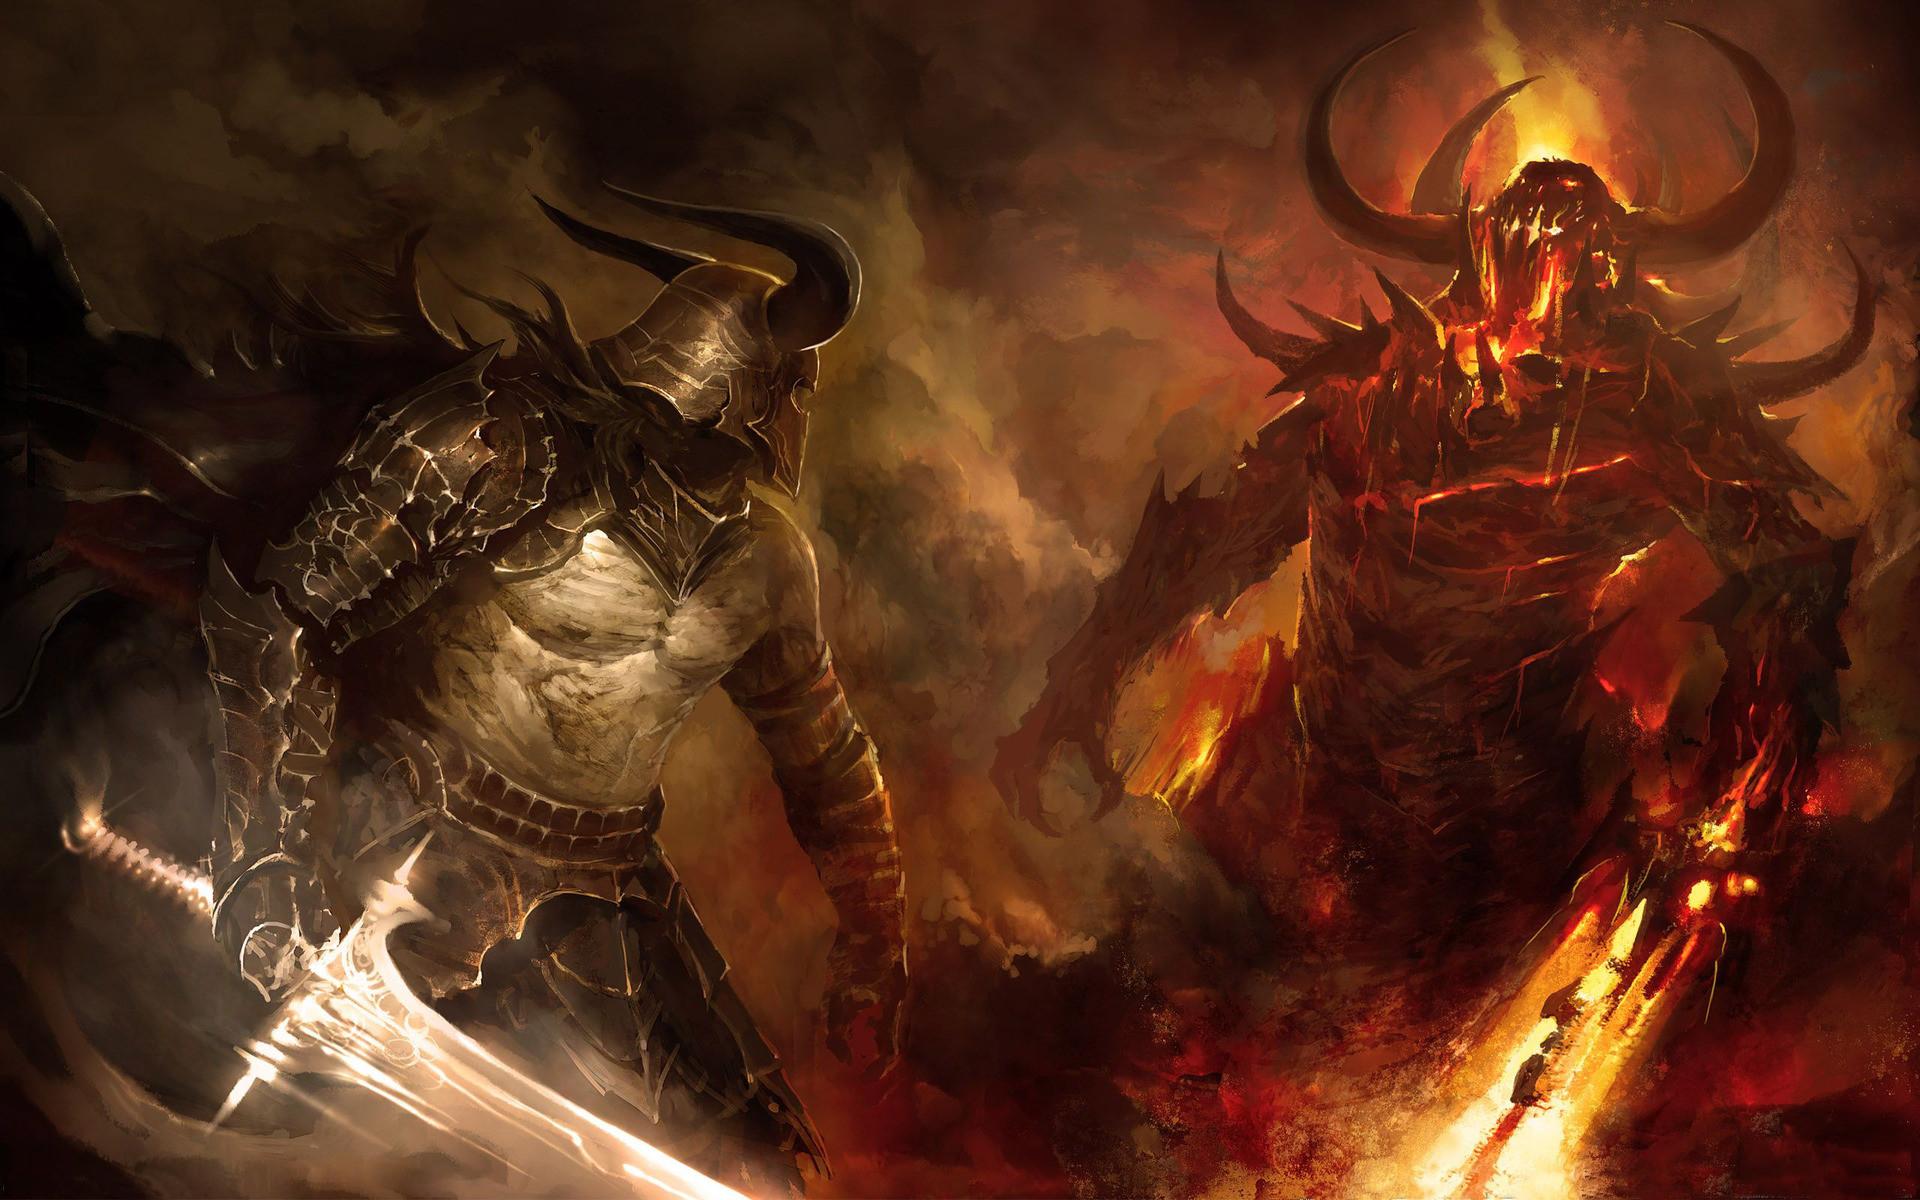 … November 13th, 2009 @ 12:24:17 331496 demon_soldiers  41034_fantasy_demon_monster_horror demon_by_chase_sc2-d3ew2p5 273106 516648  · Demon Wallpapers …